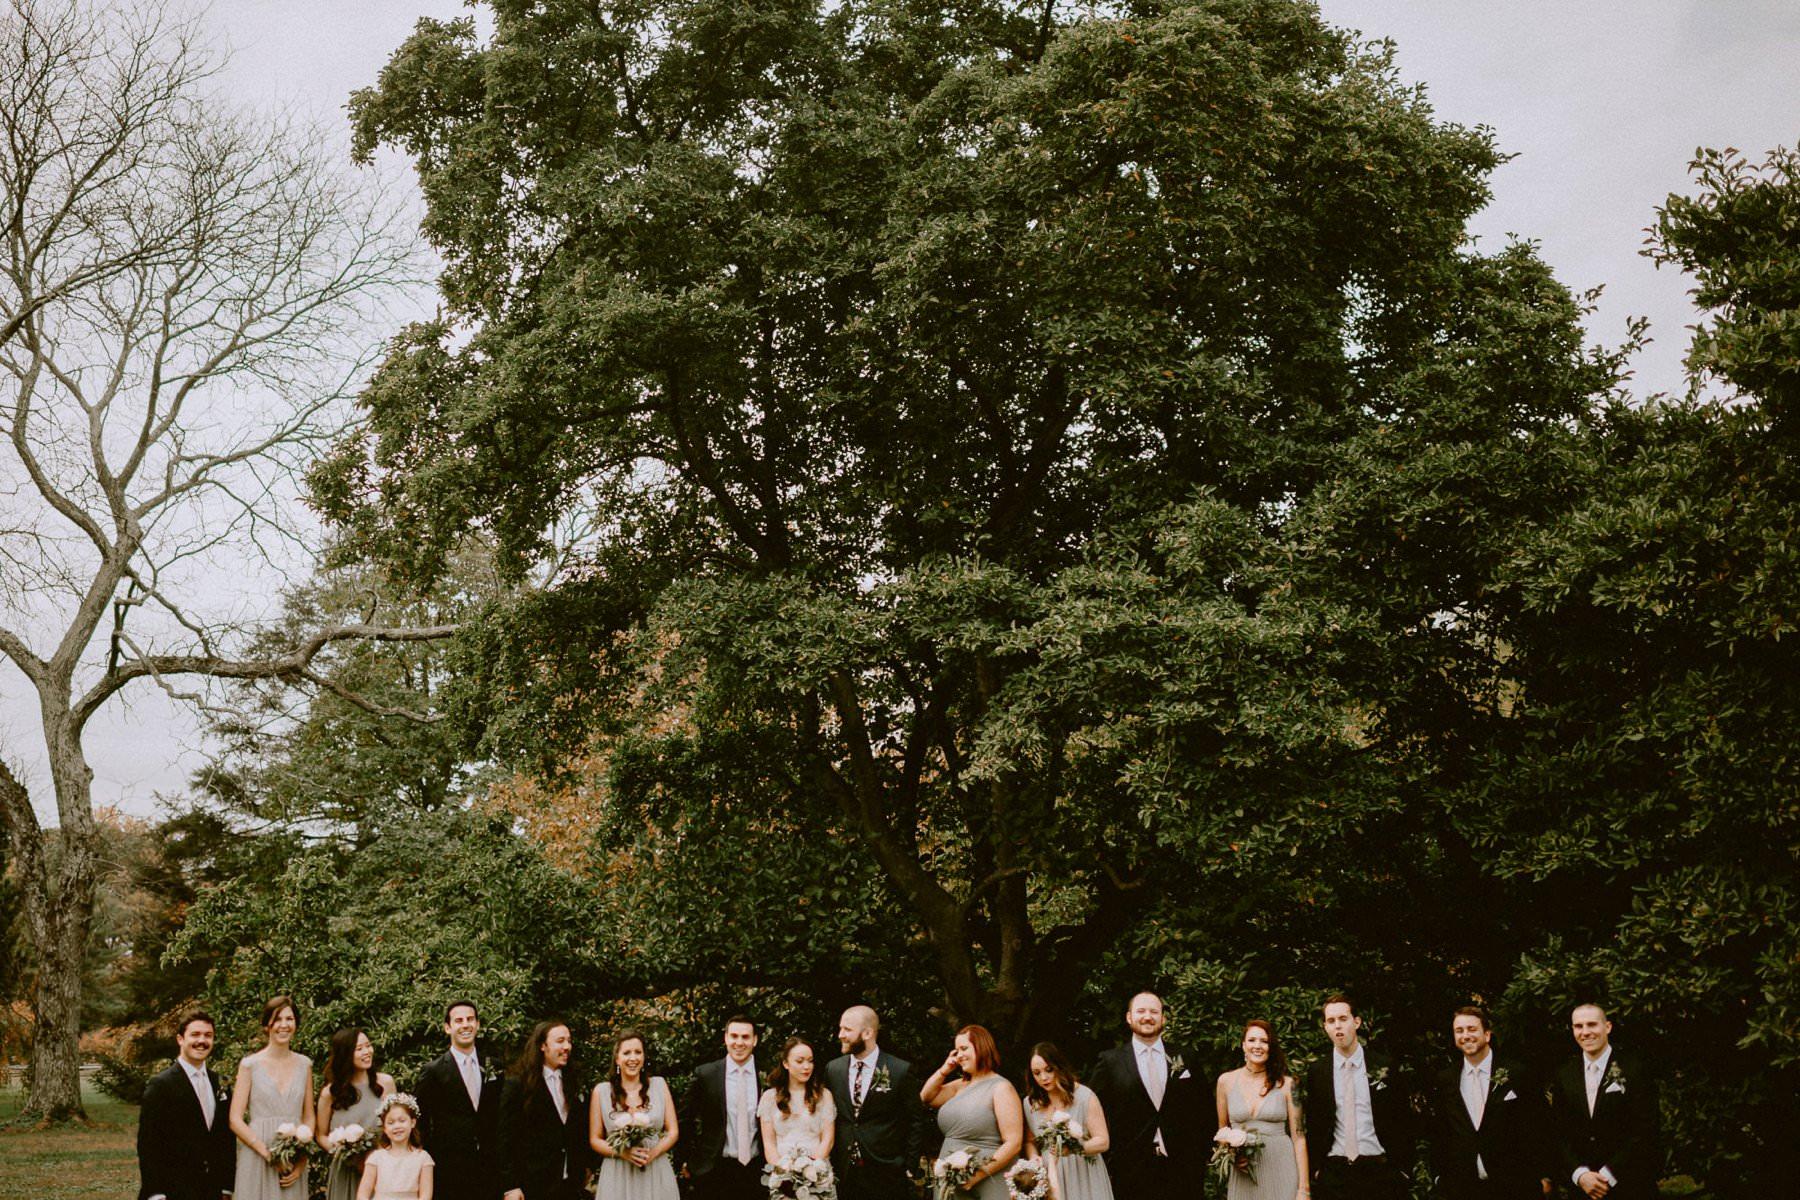 Tyler_arboretum_wedding-023.jpg